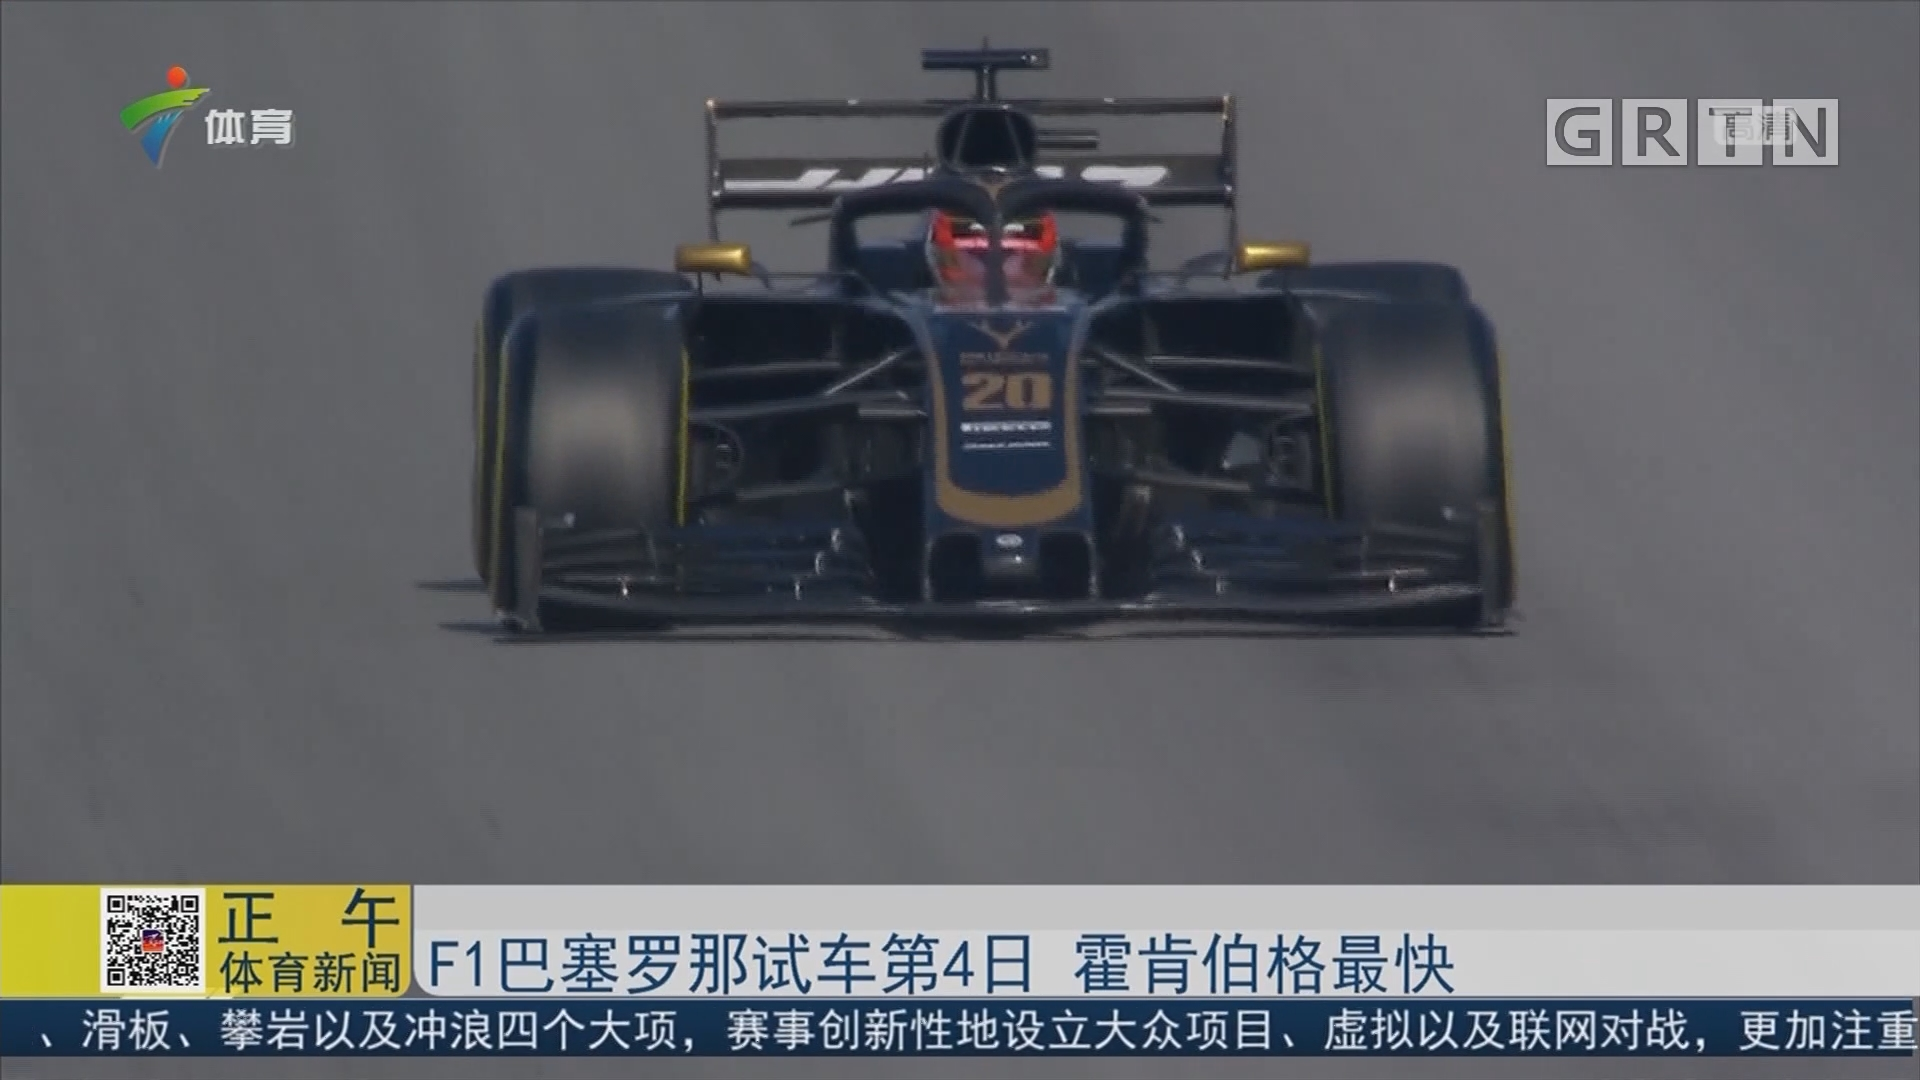 F1巴塞罗那试车第4日 霍肯伯格最快